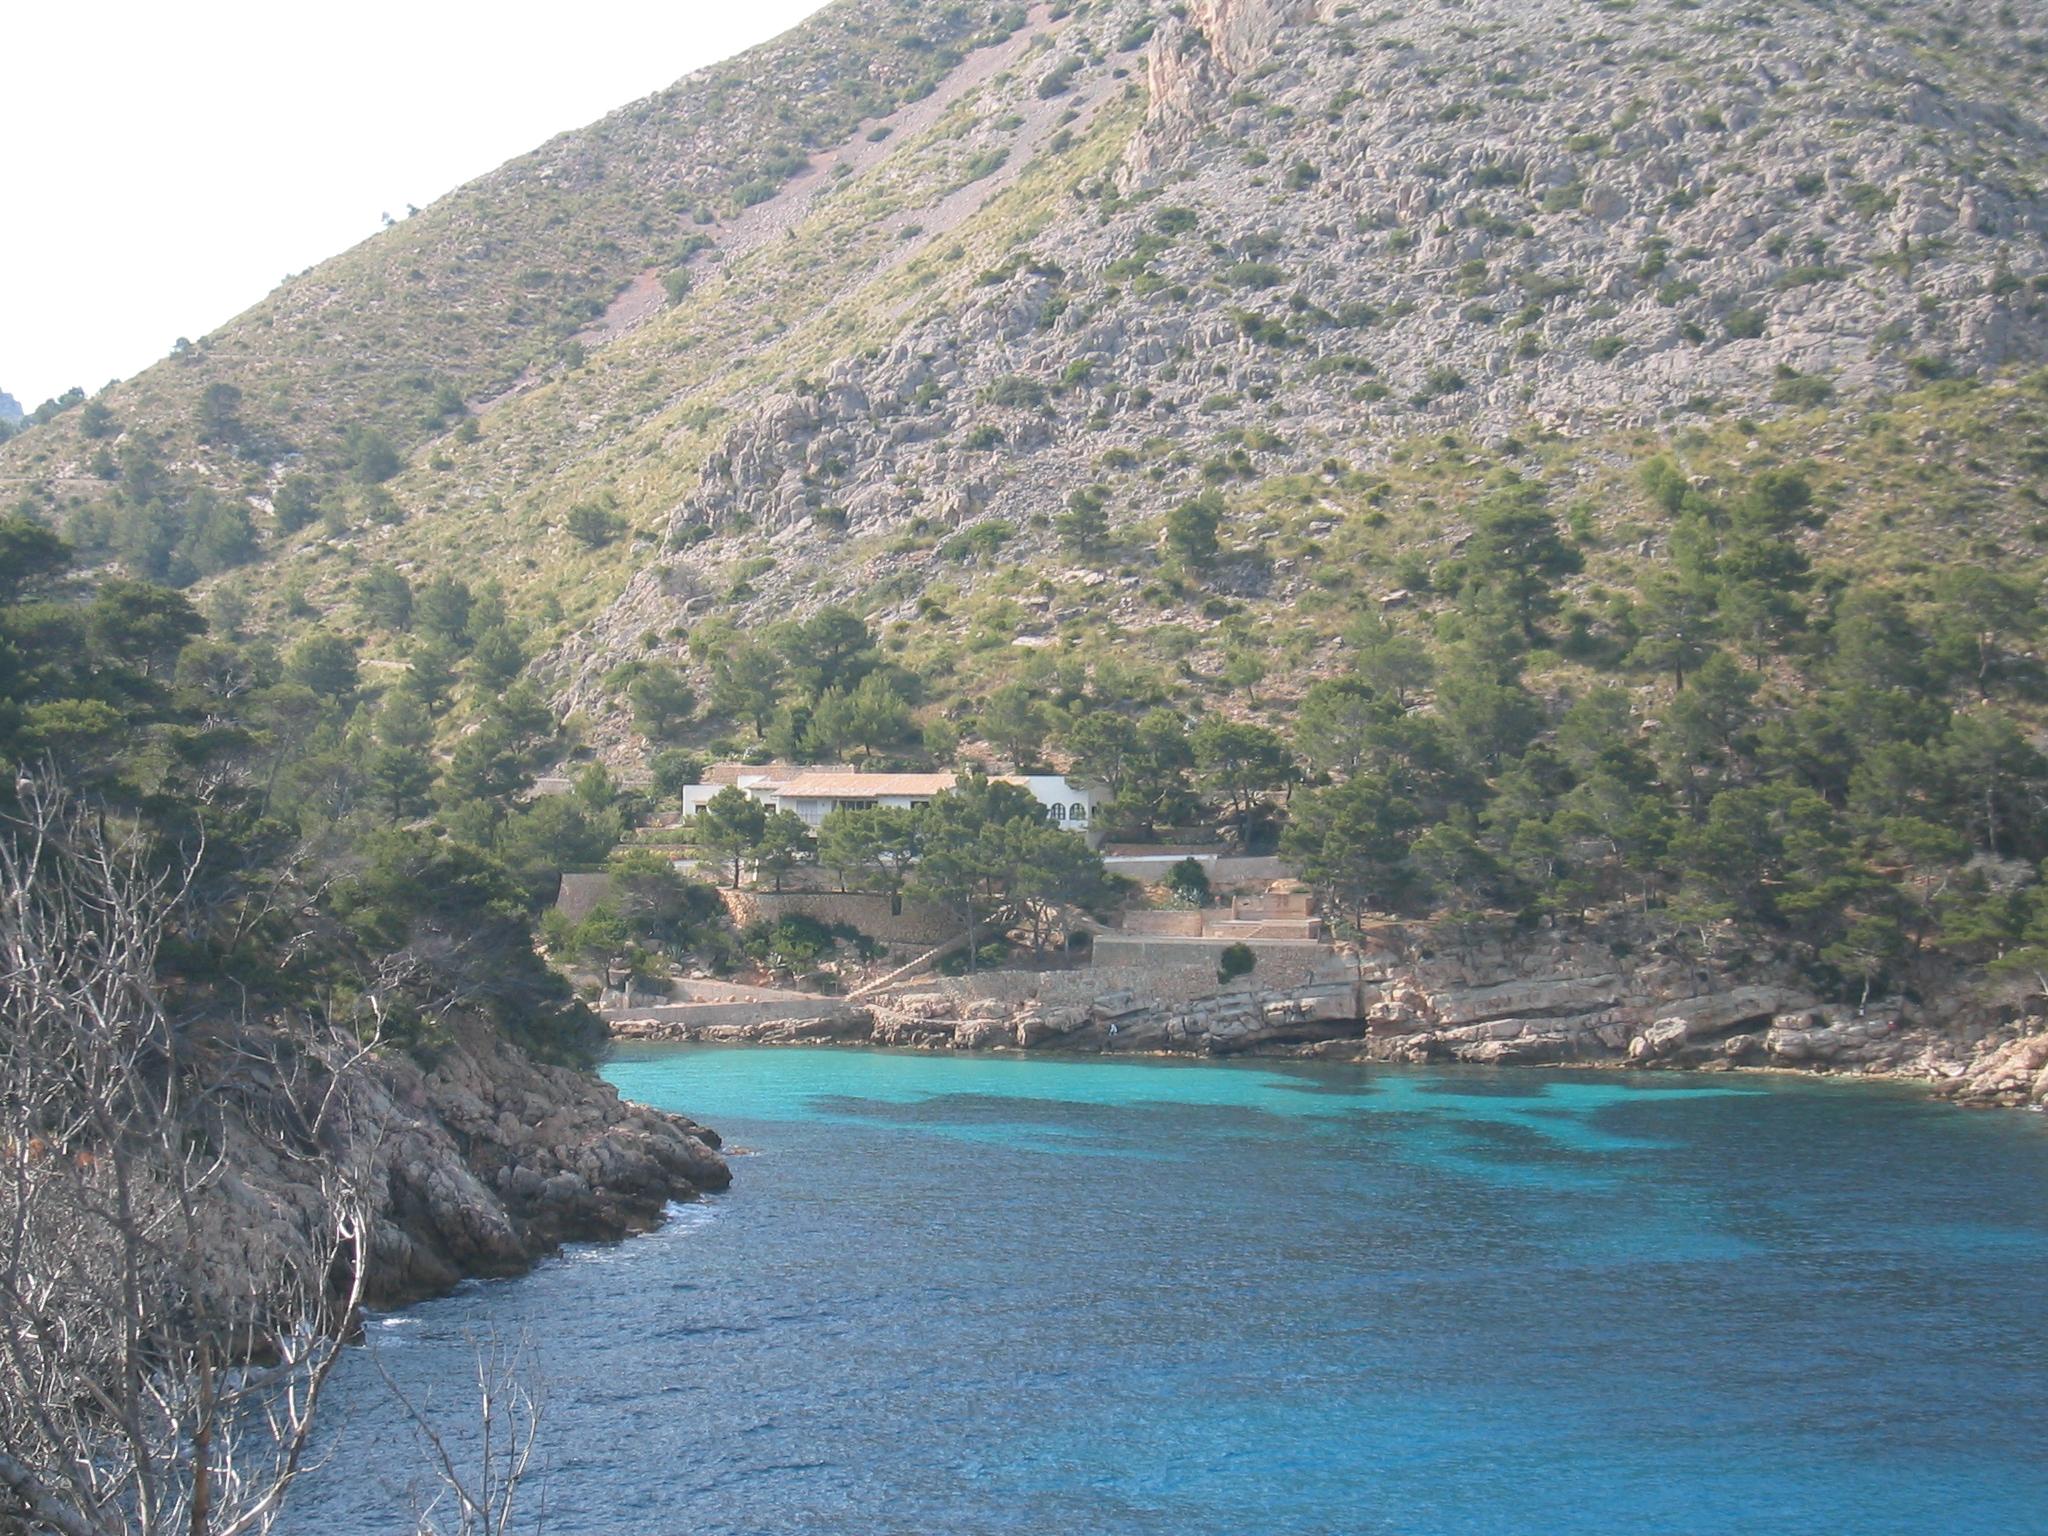 Foto playa Cala en gossalba. Cala Murta 14 may 2006